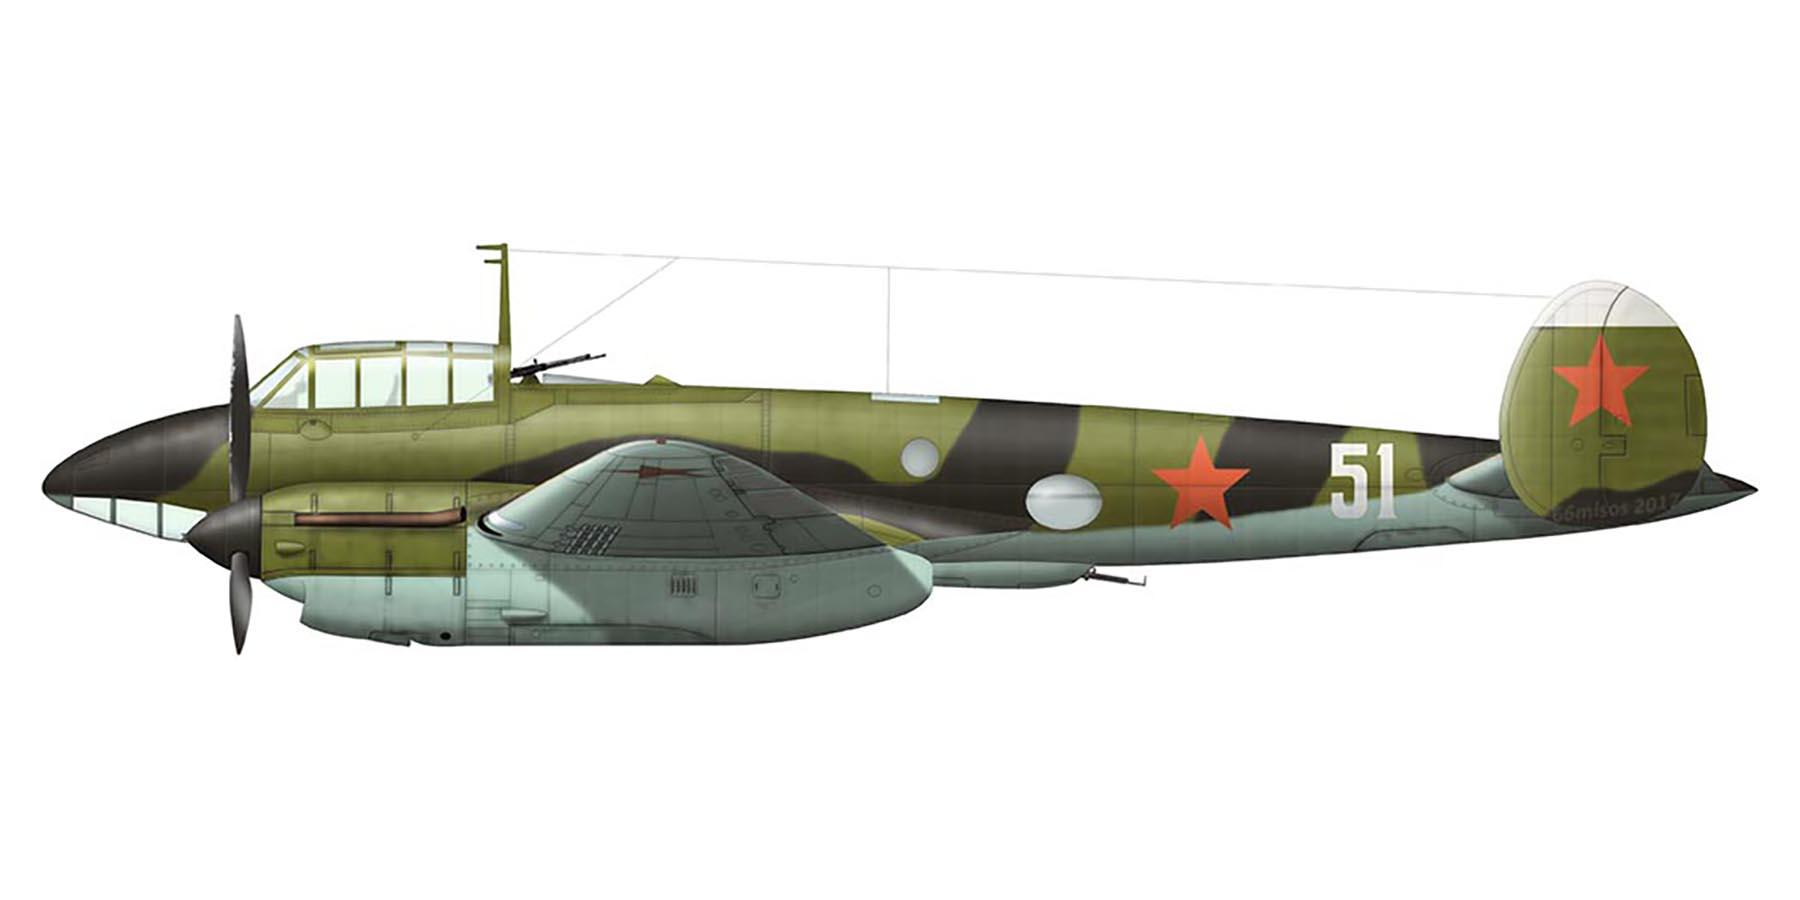 Petlyakov Pe 2 type 1 29BAP Northern Fleet White 51 1944 0A